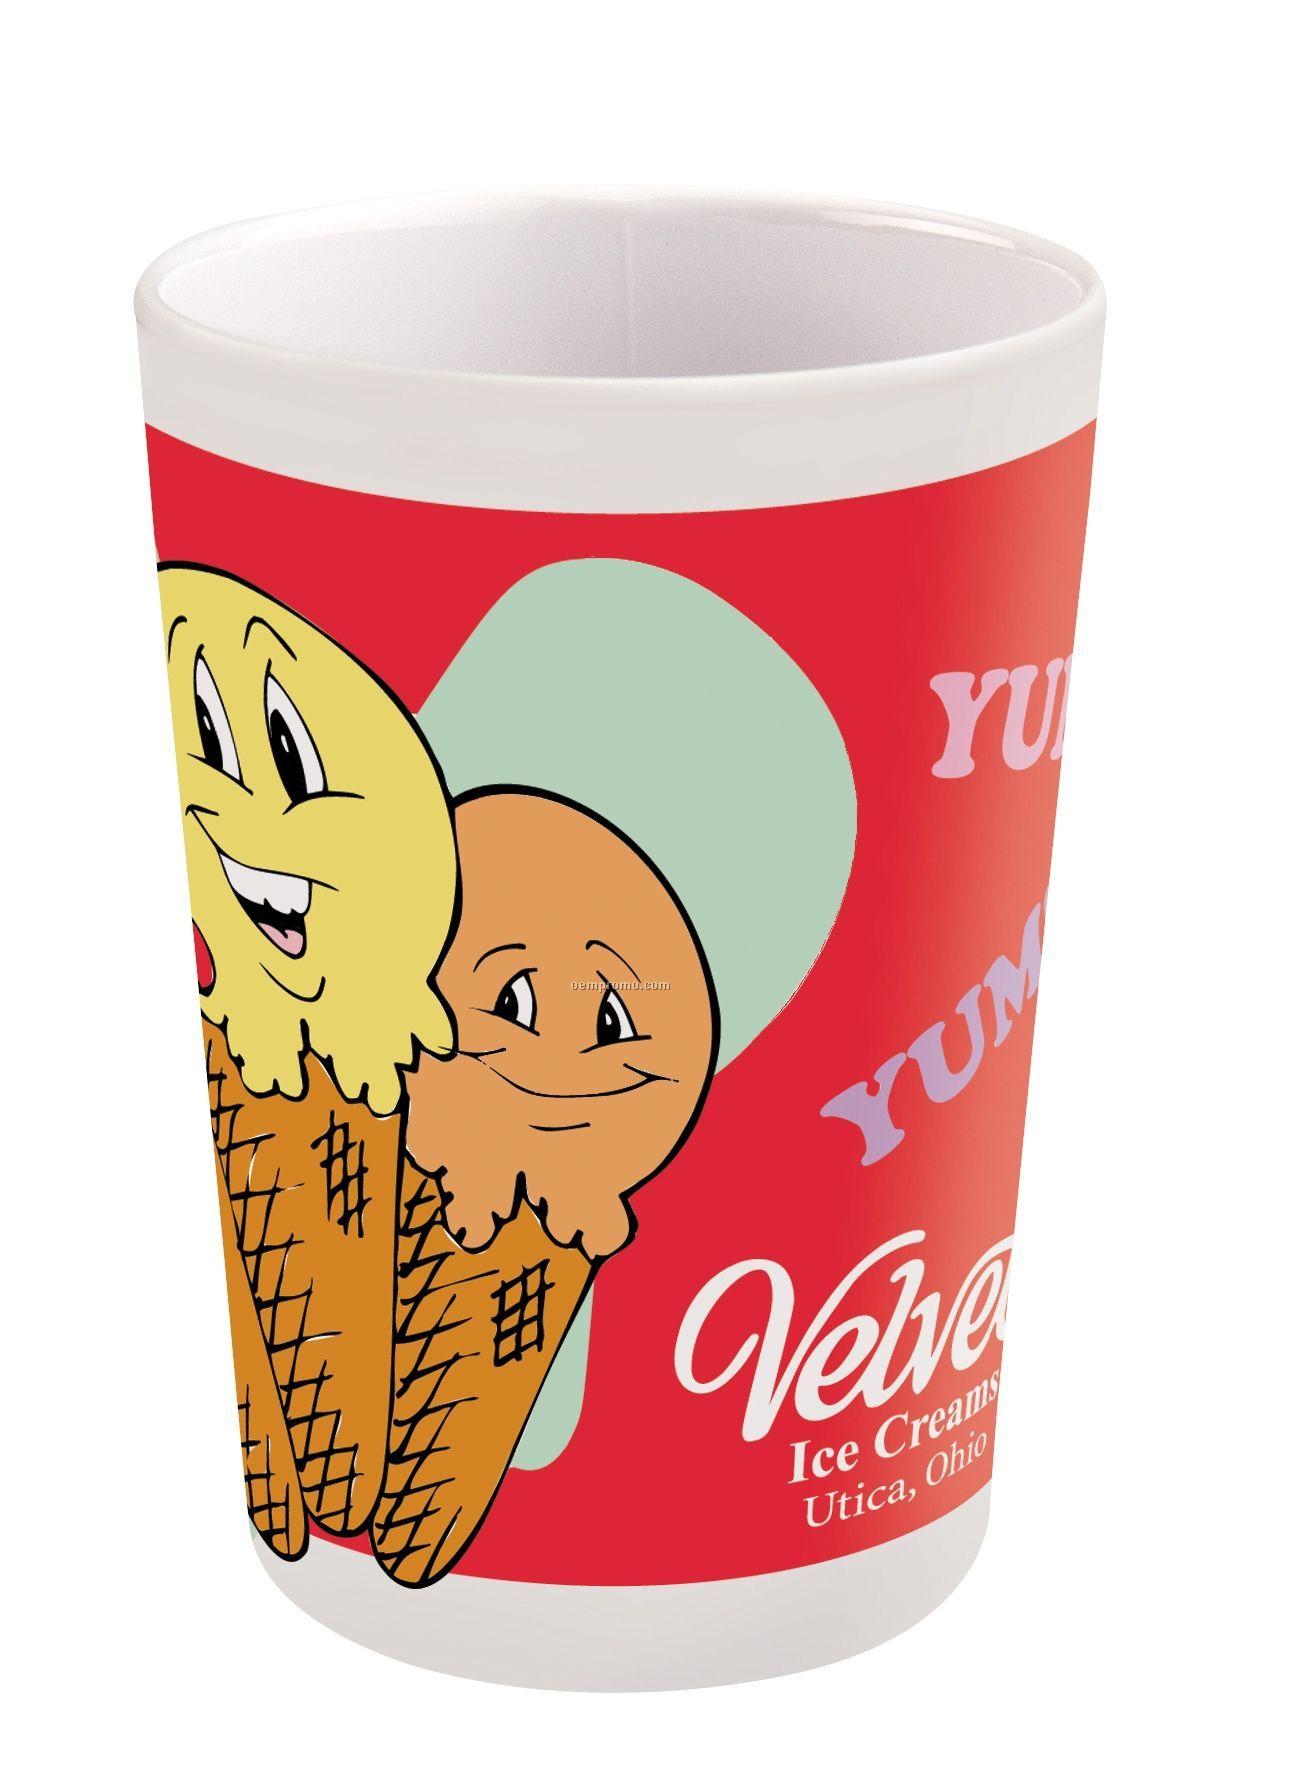 8 Oz. Melamine Cup